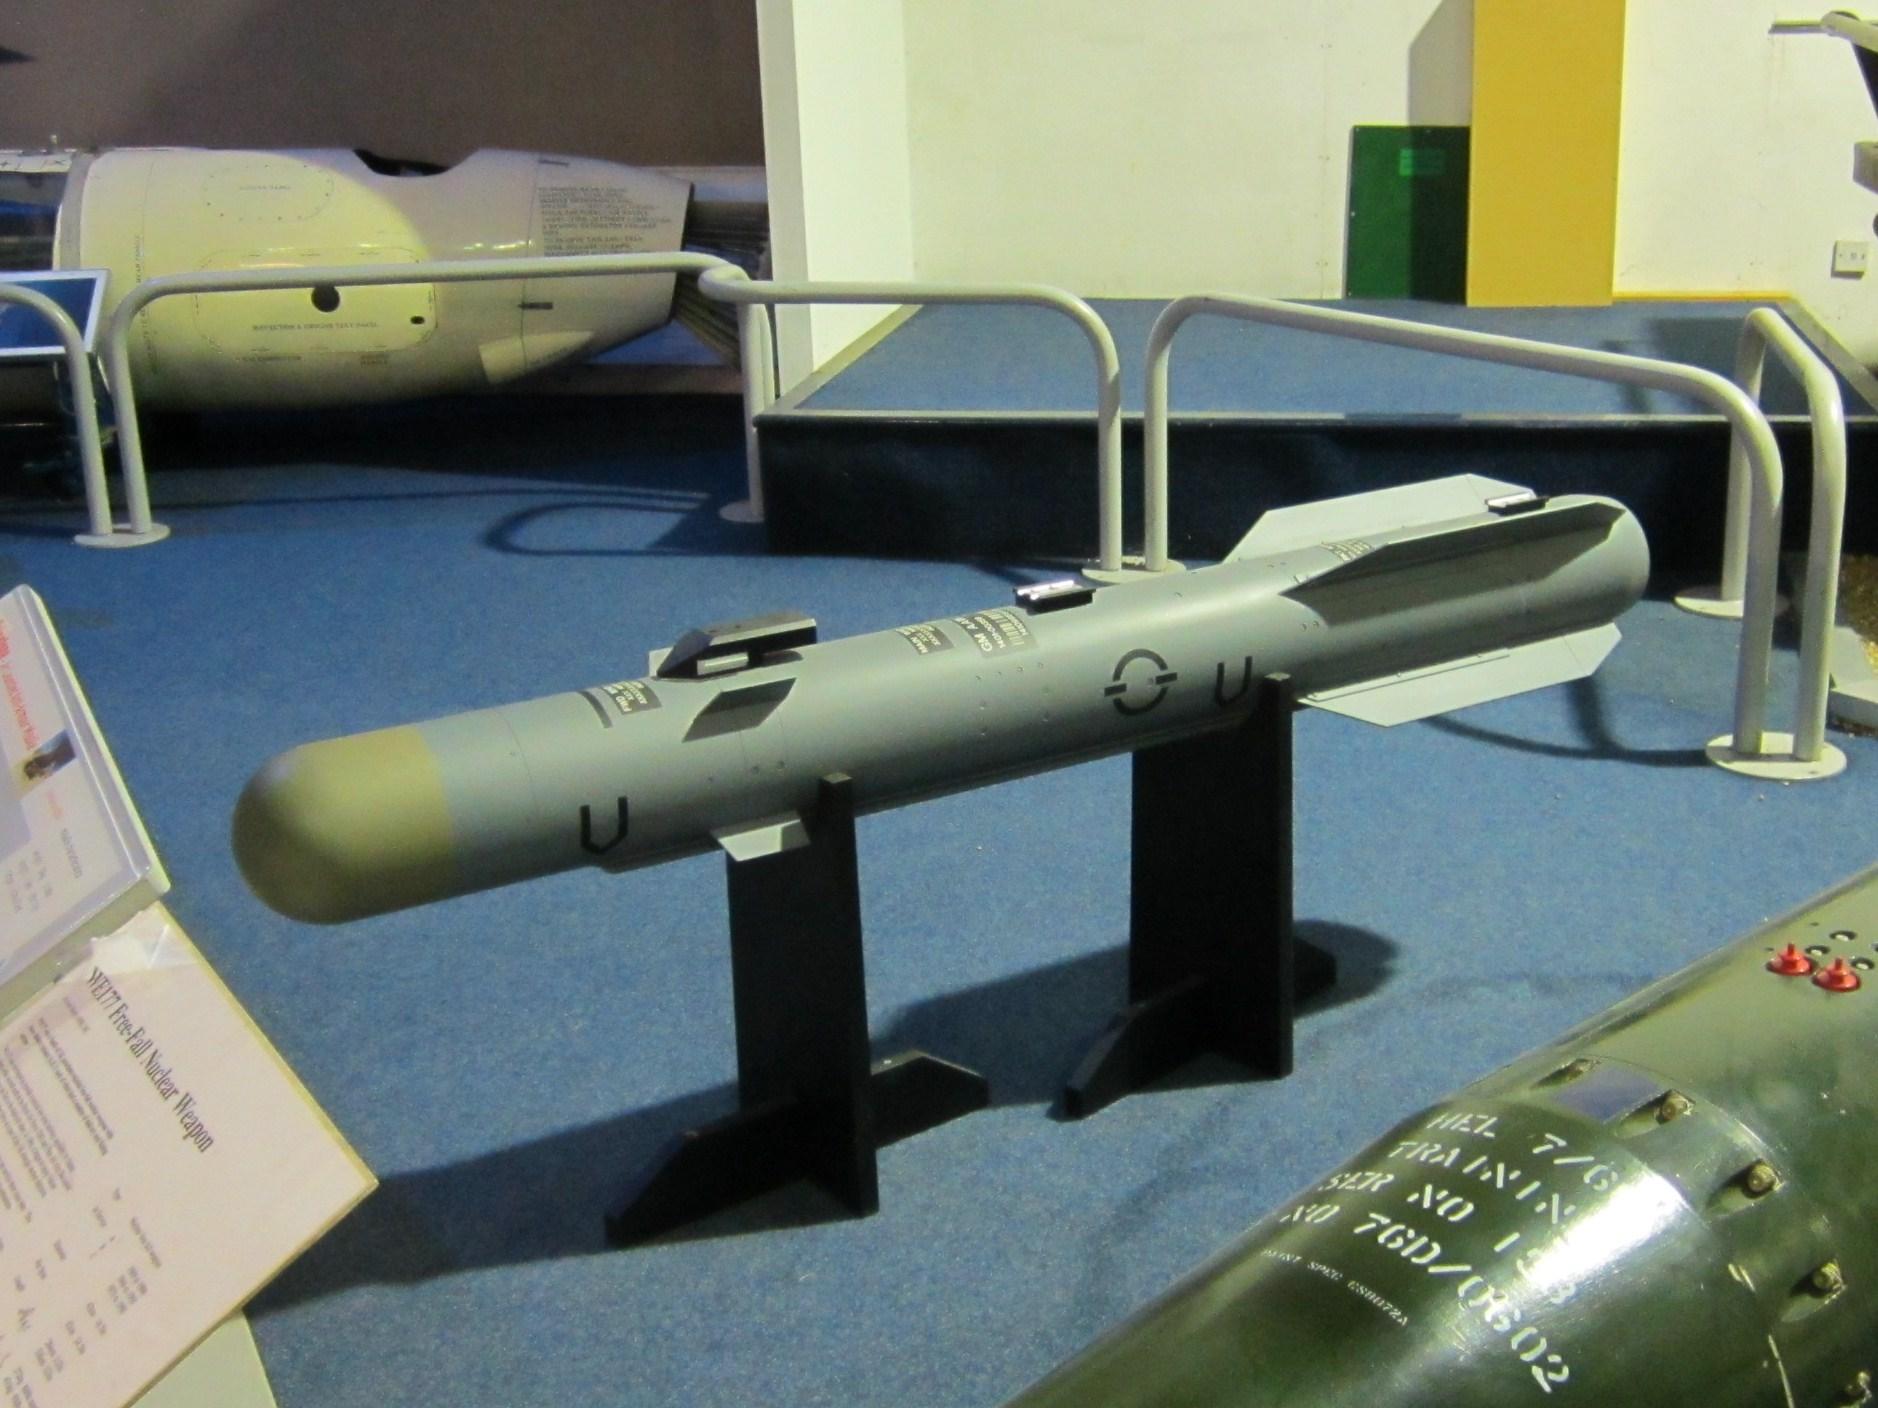 Brimstone_missile_at_RAF_Museum_London